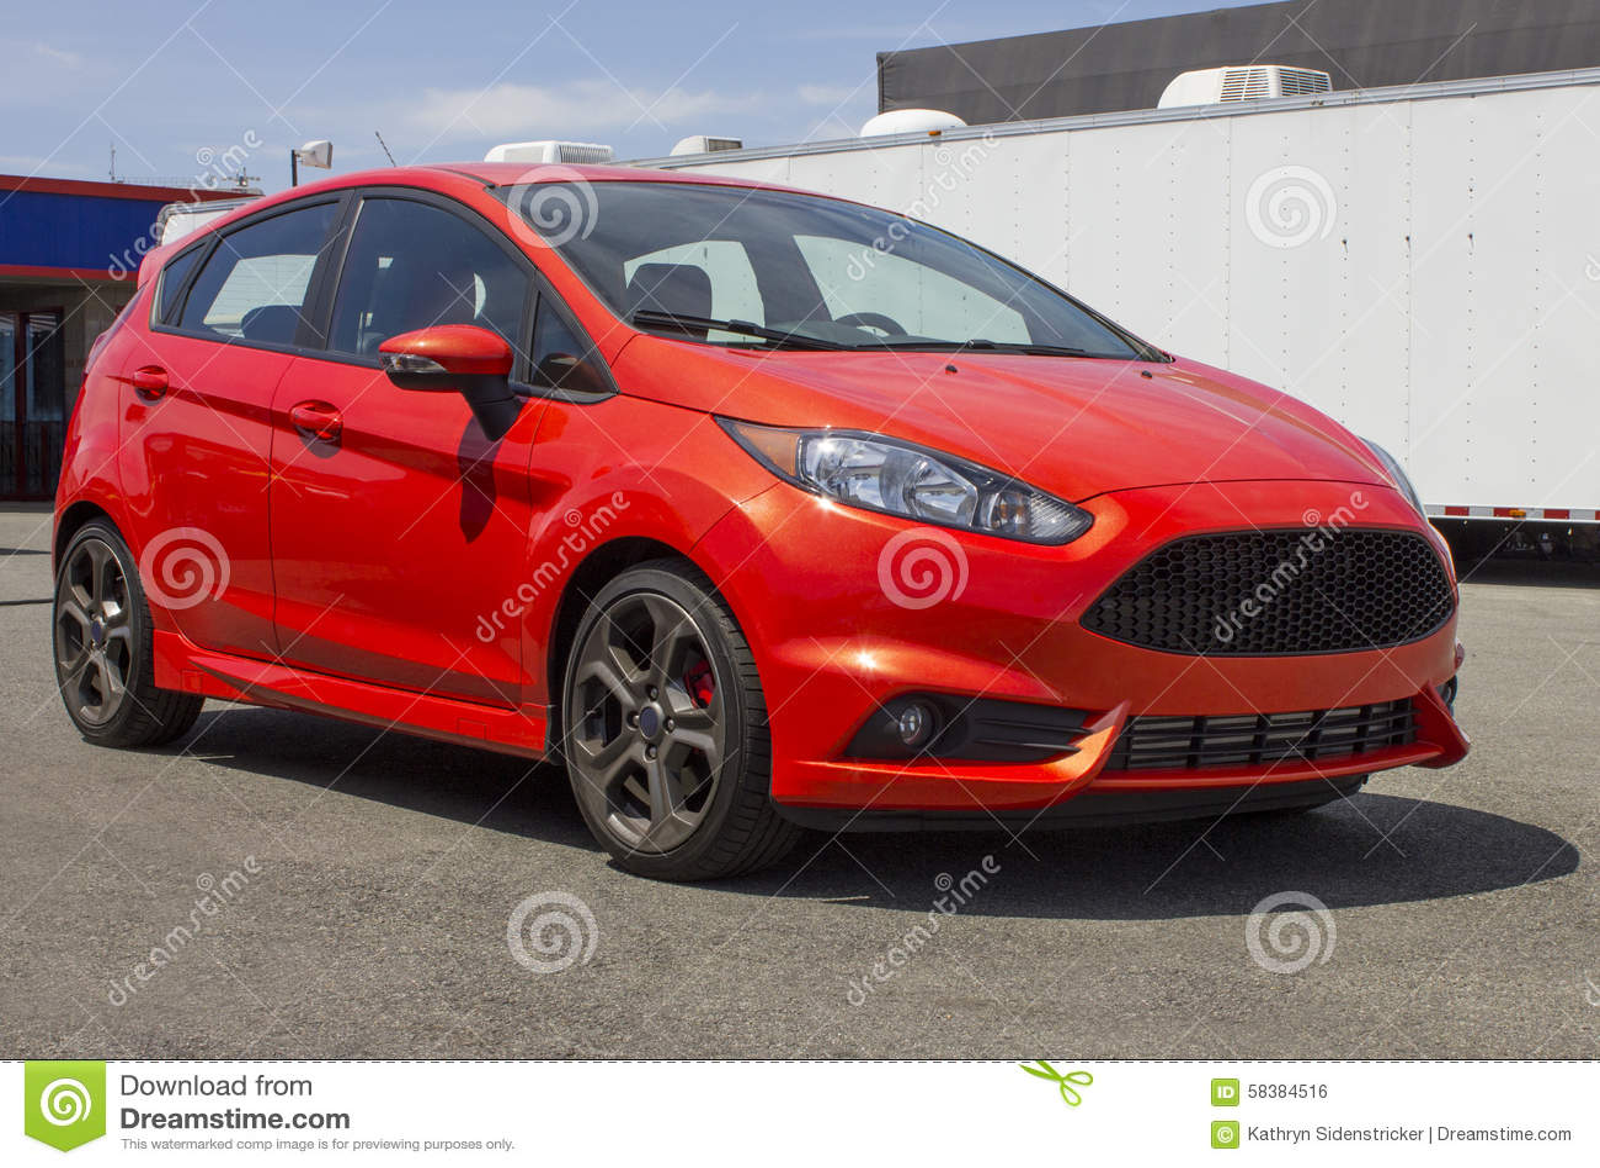 2015 Ford Festiva ST Hatchback Red